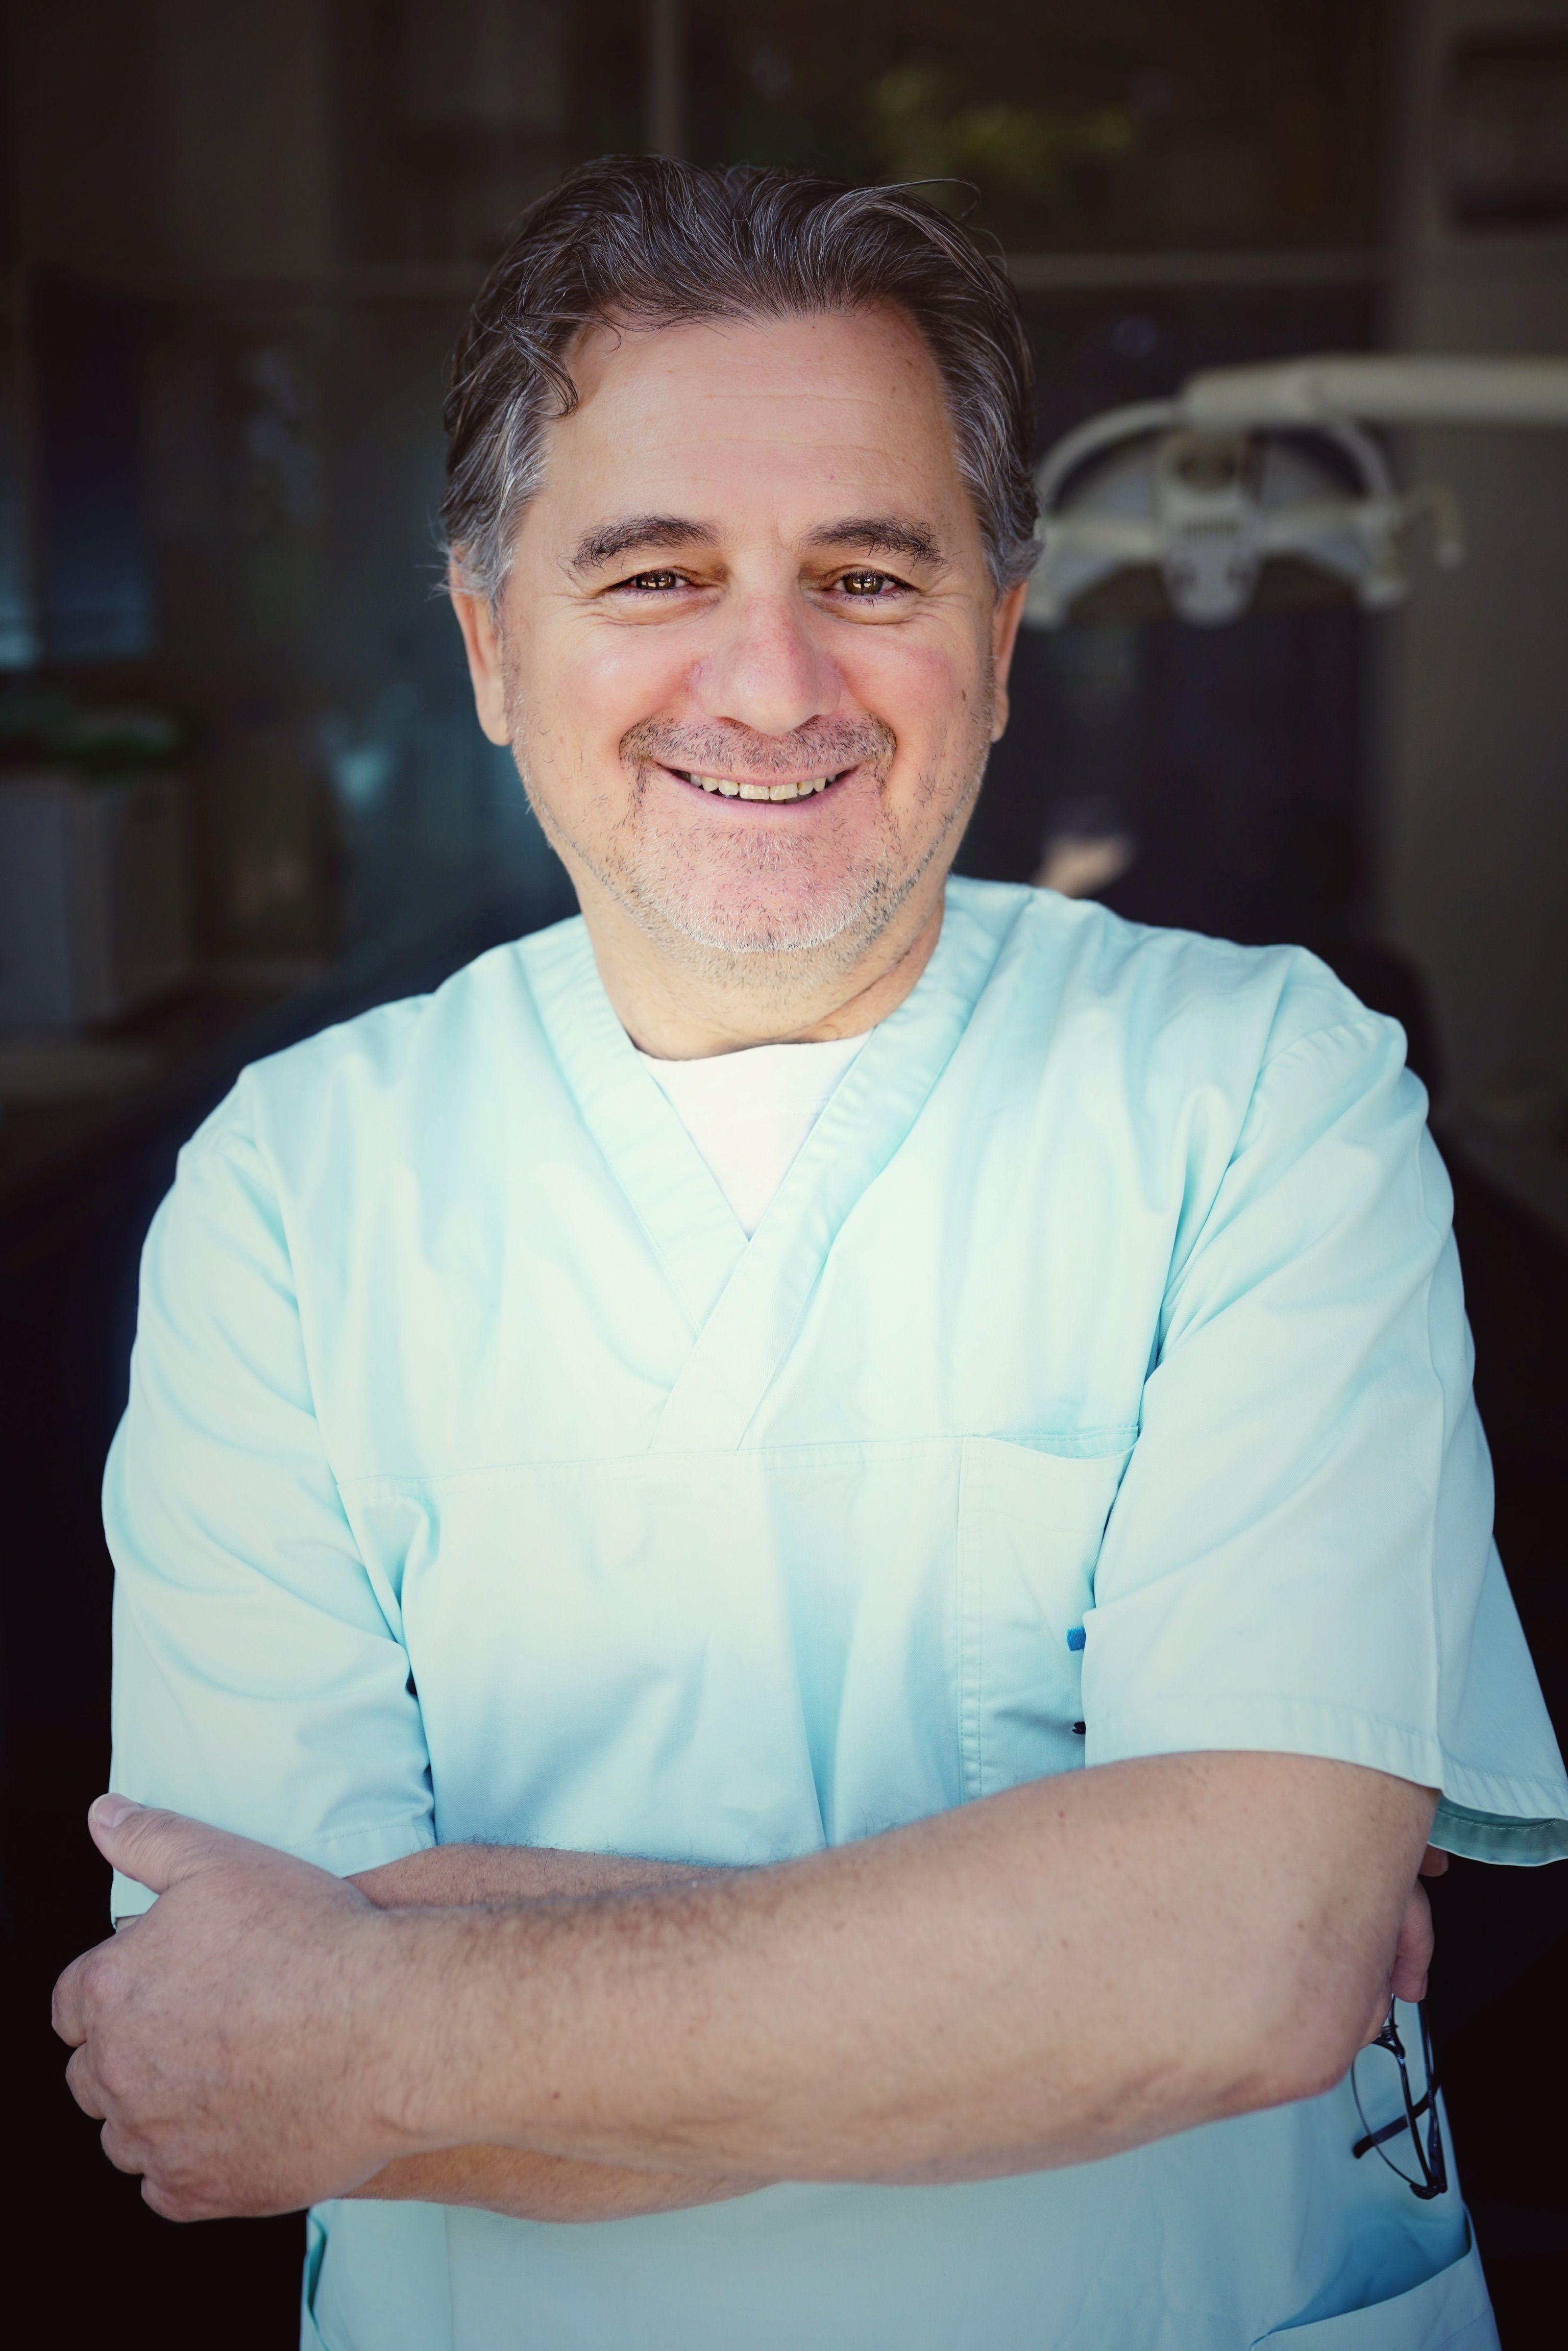 Tim stomatologija Jurišić